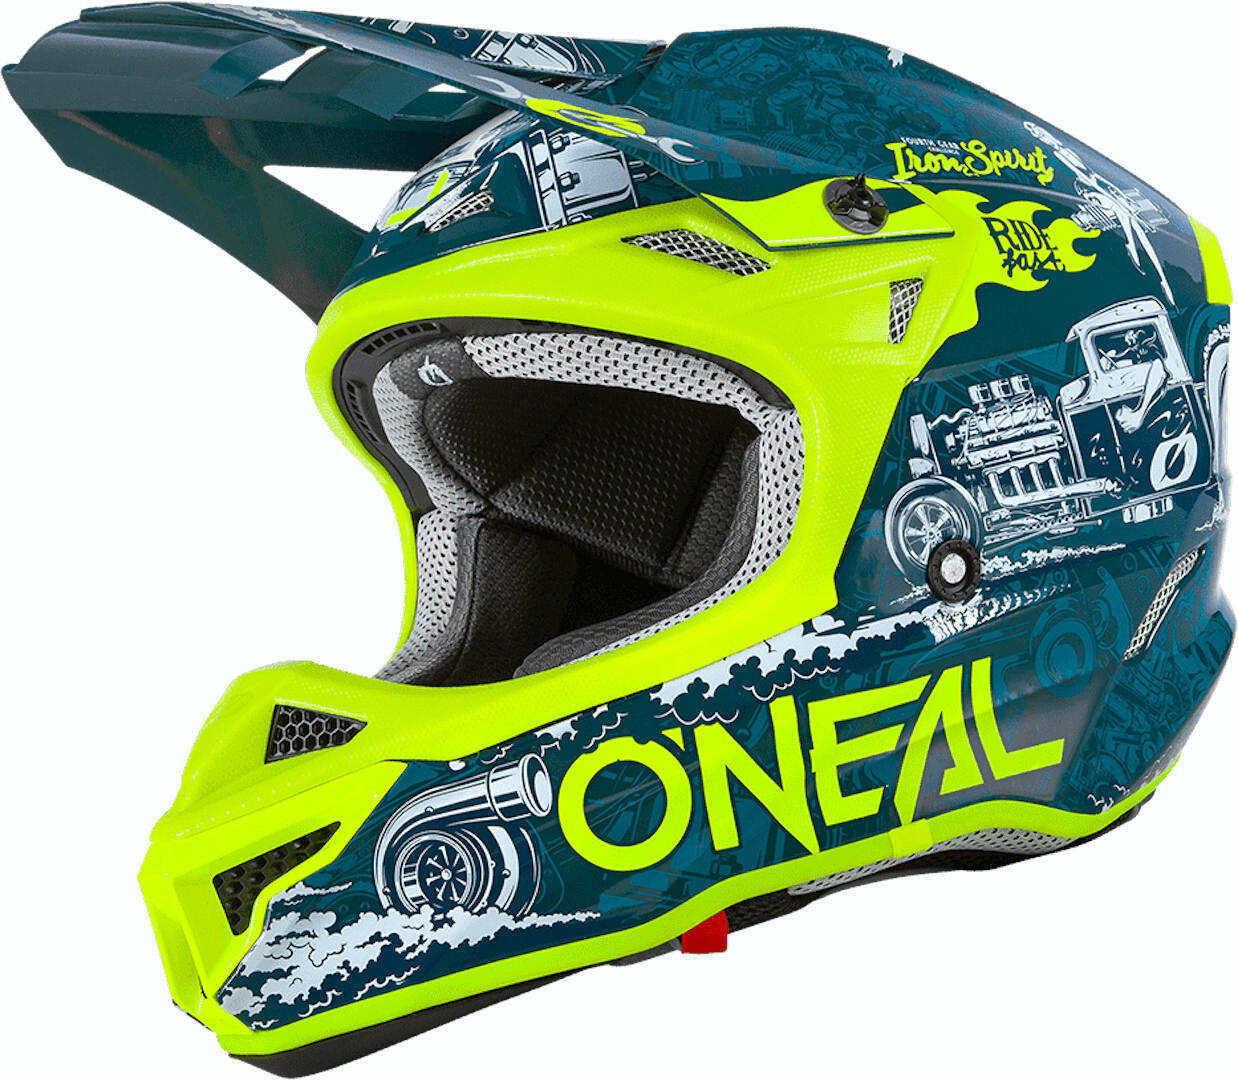 Oneal 5Series Polyacrylite HR Motocross Helm, gelb-blau, Größe XL, gelb-blau, Größe XL